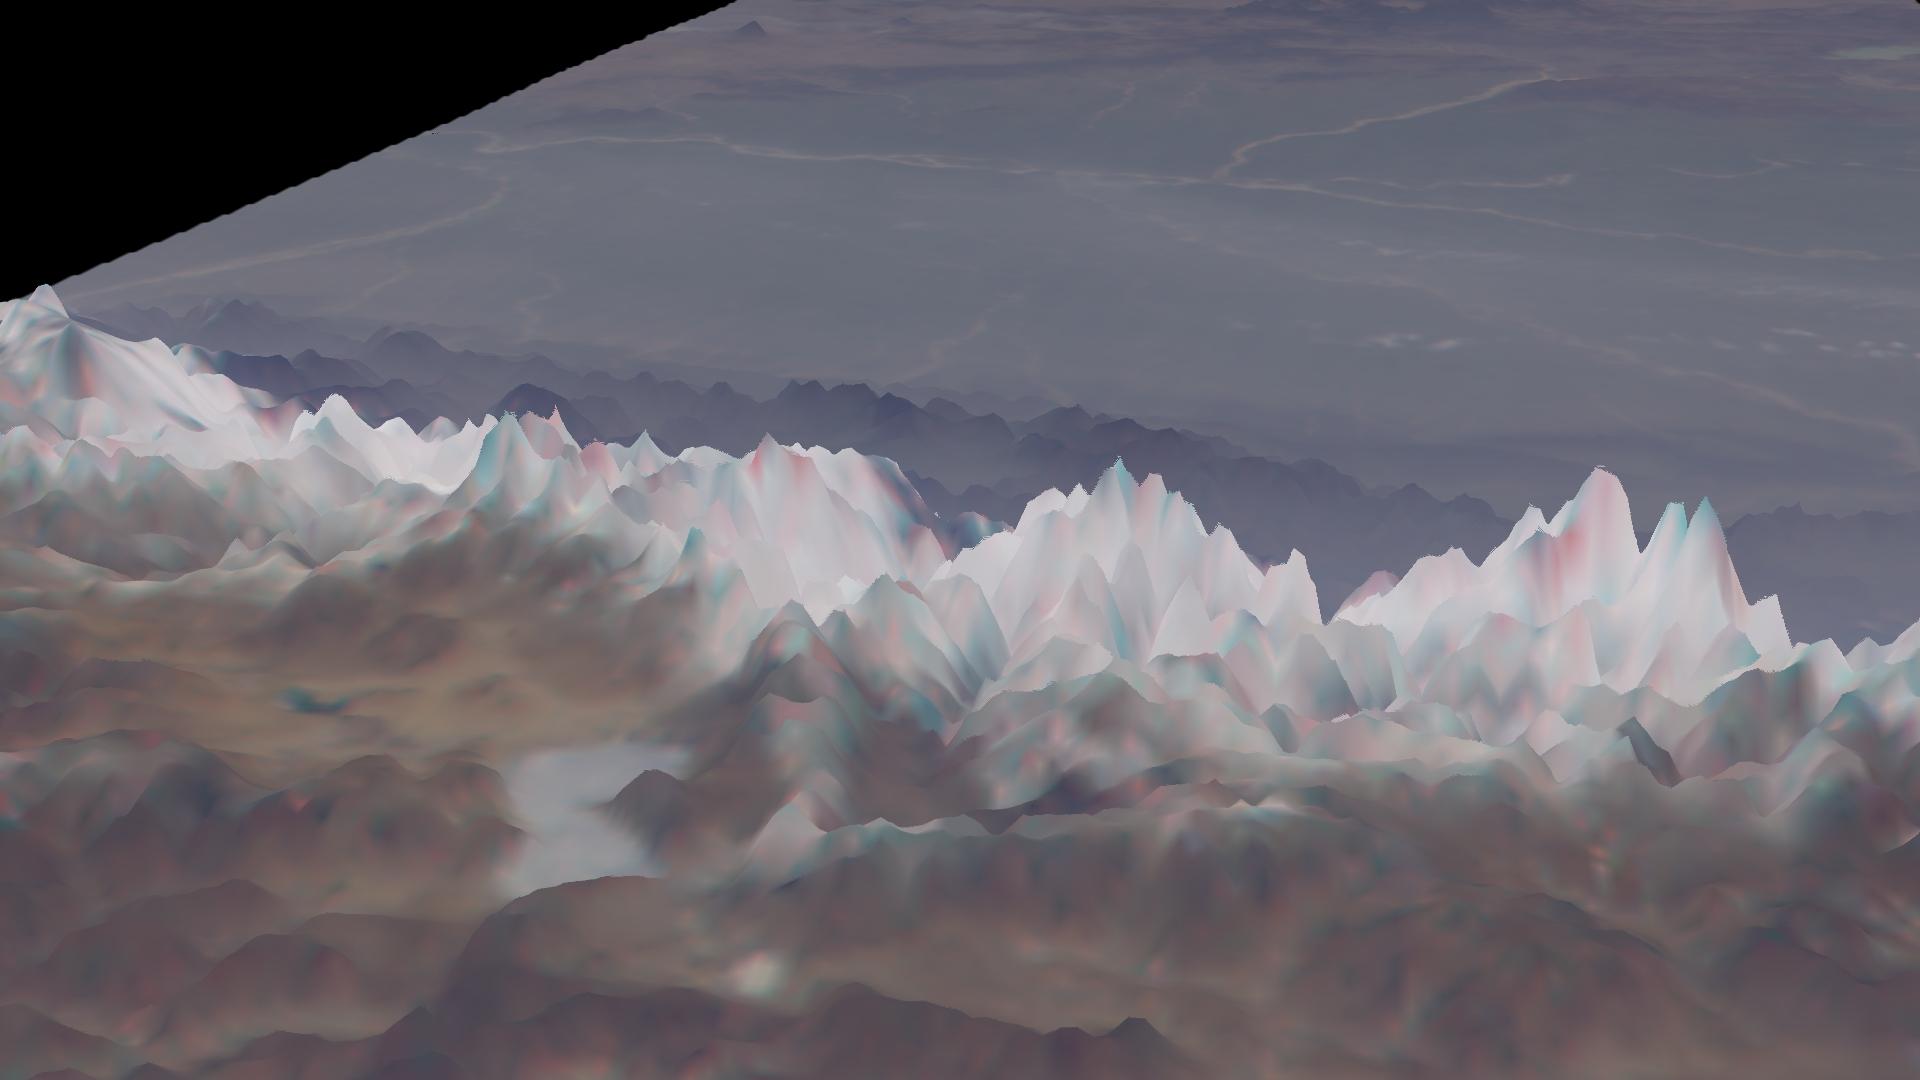 Vista oblicua de la cordillera del Himalaya  de MISR